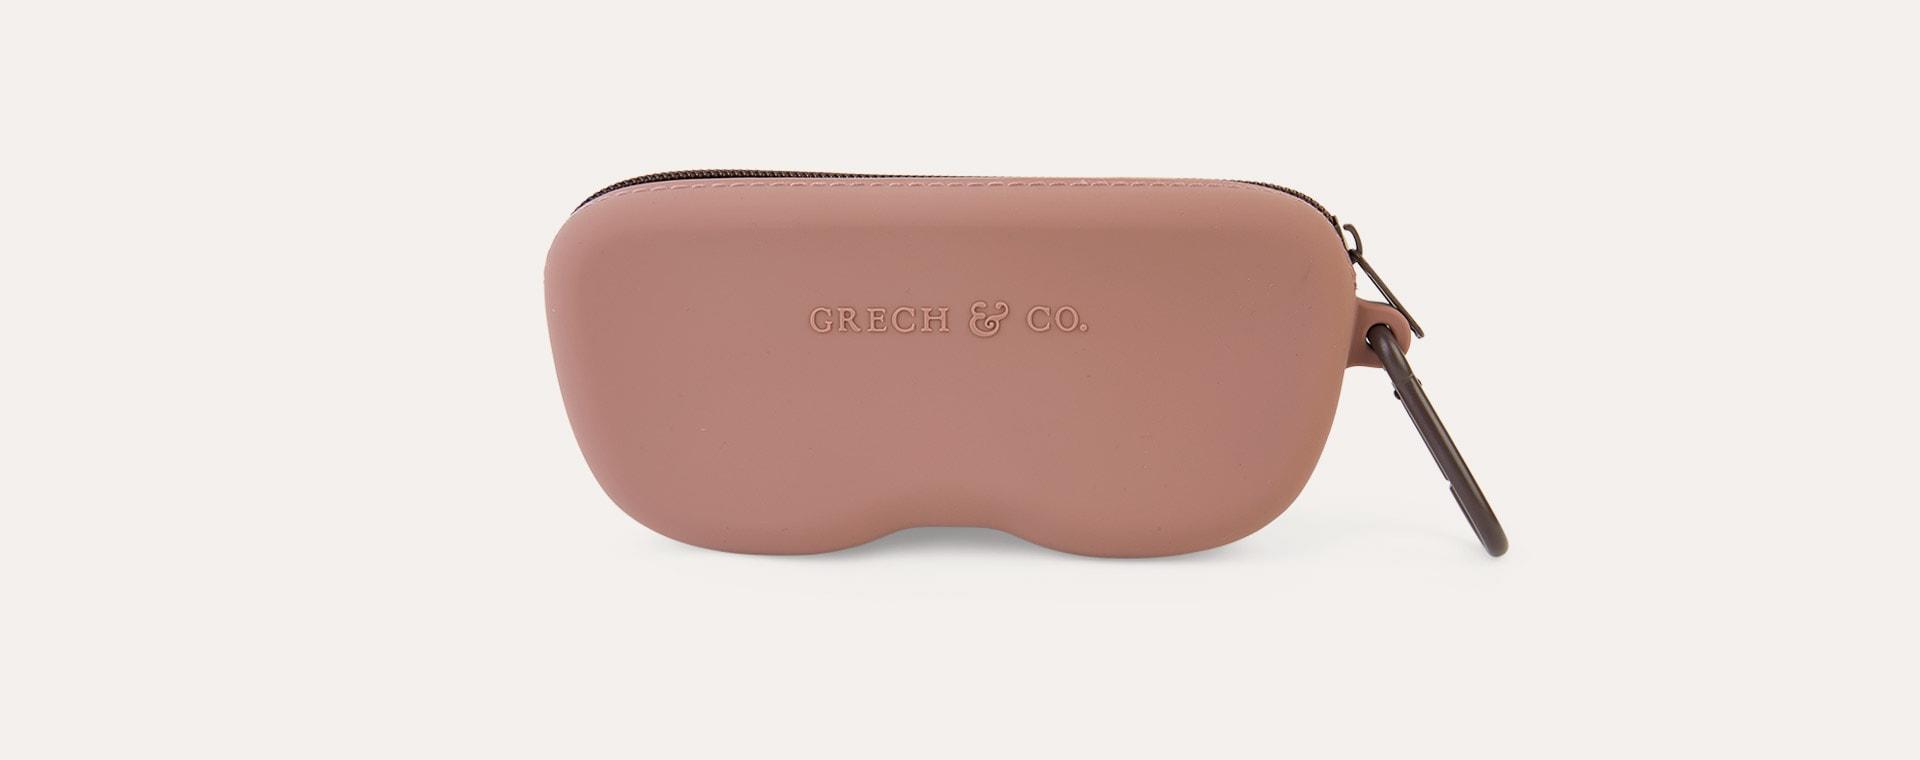 Burlwood Grech & Co Sunglasses Case